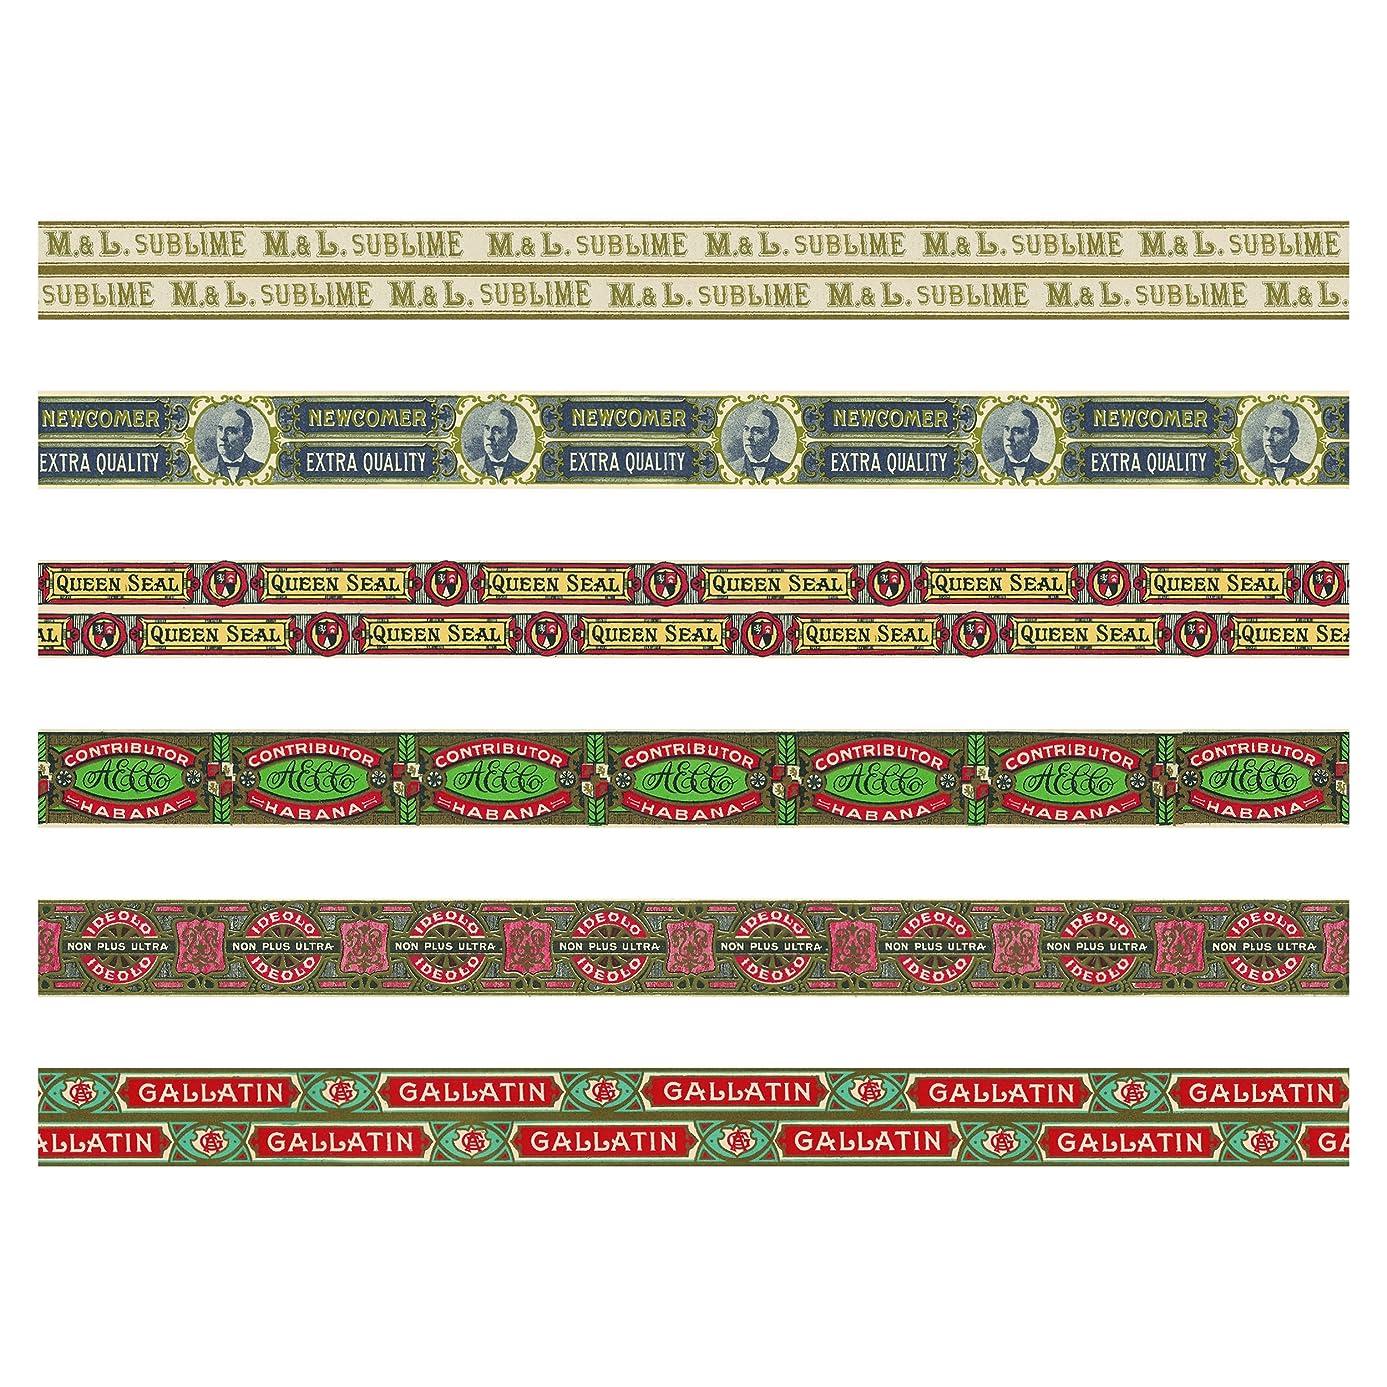 Advantus TH93675 Humidor Idea-Ology Design Tape, Multicolor